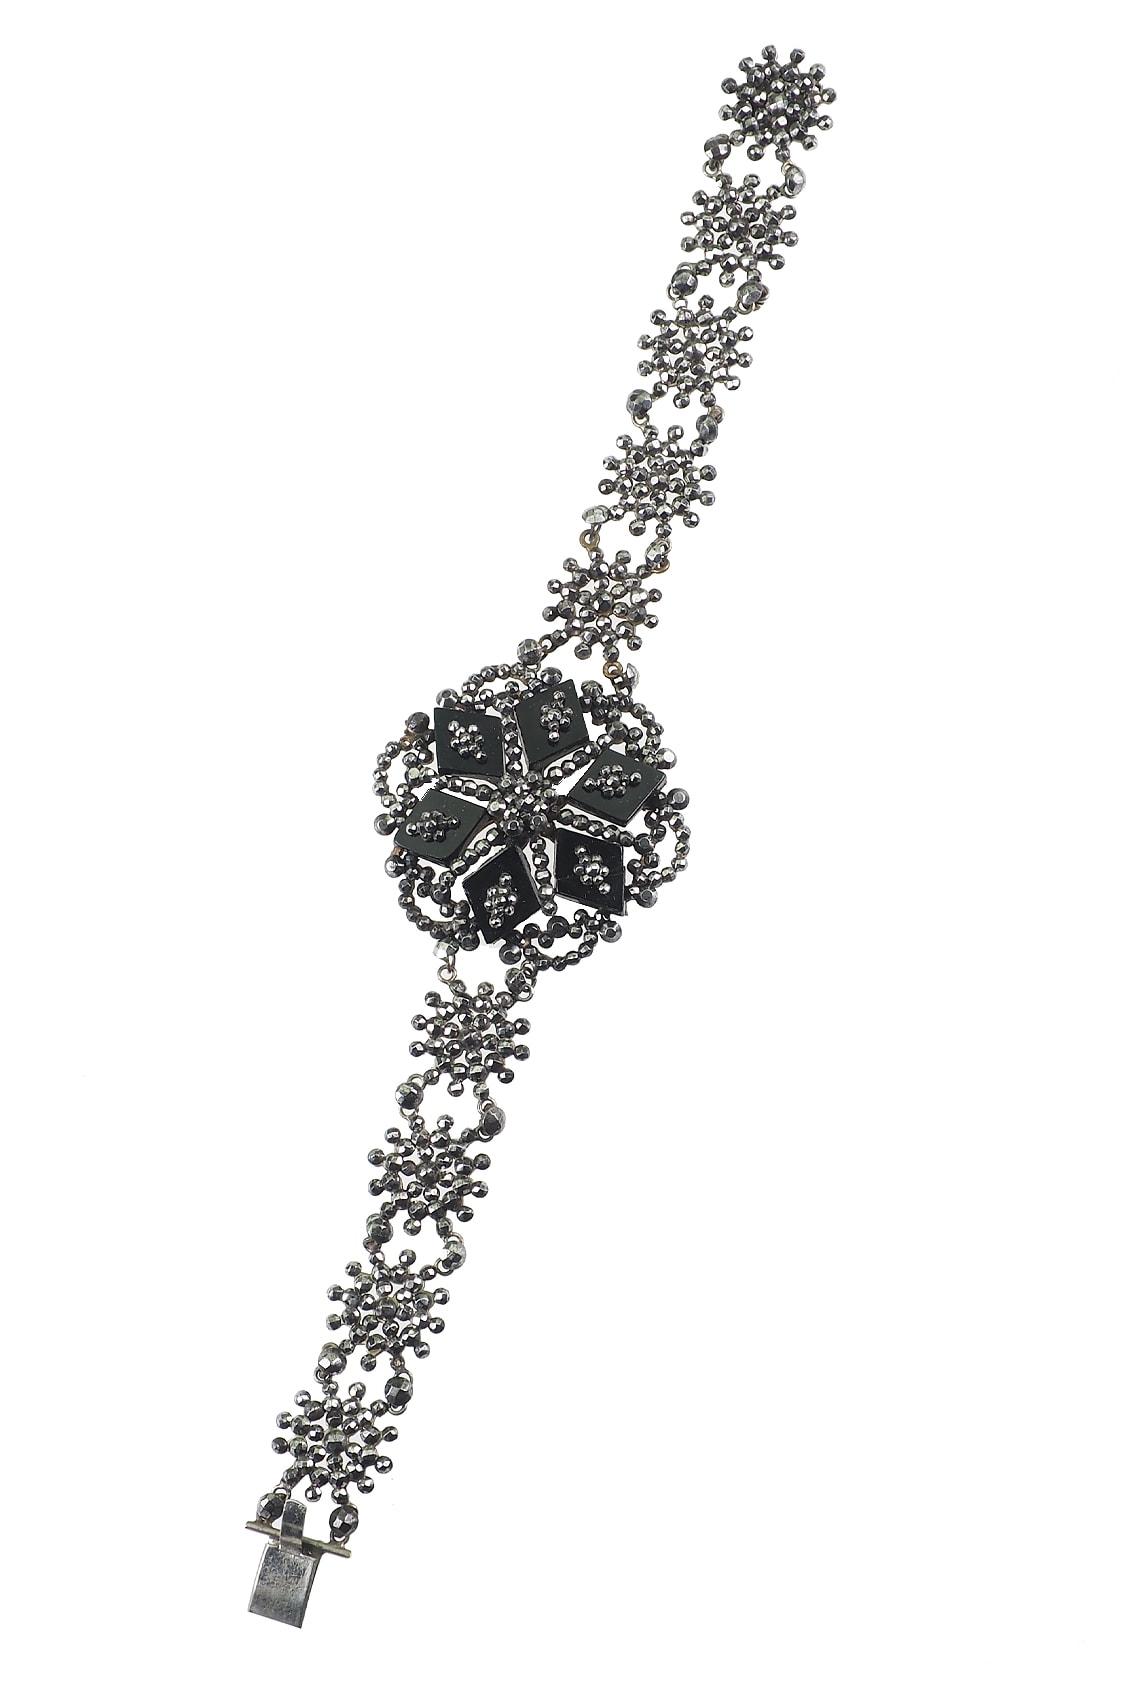 antikschmuck-armband-1120